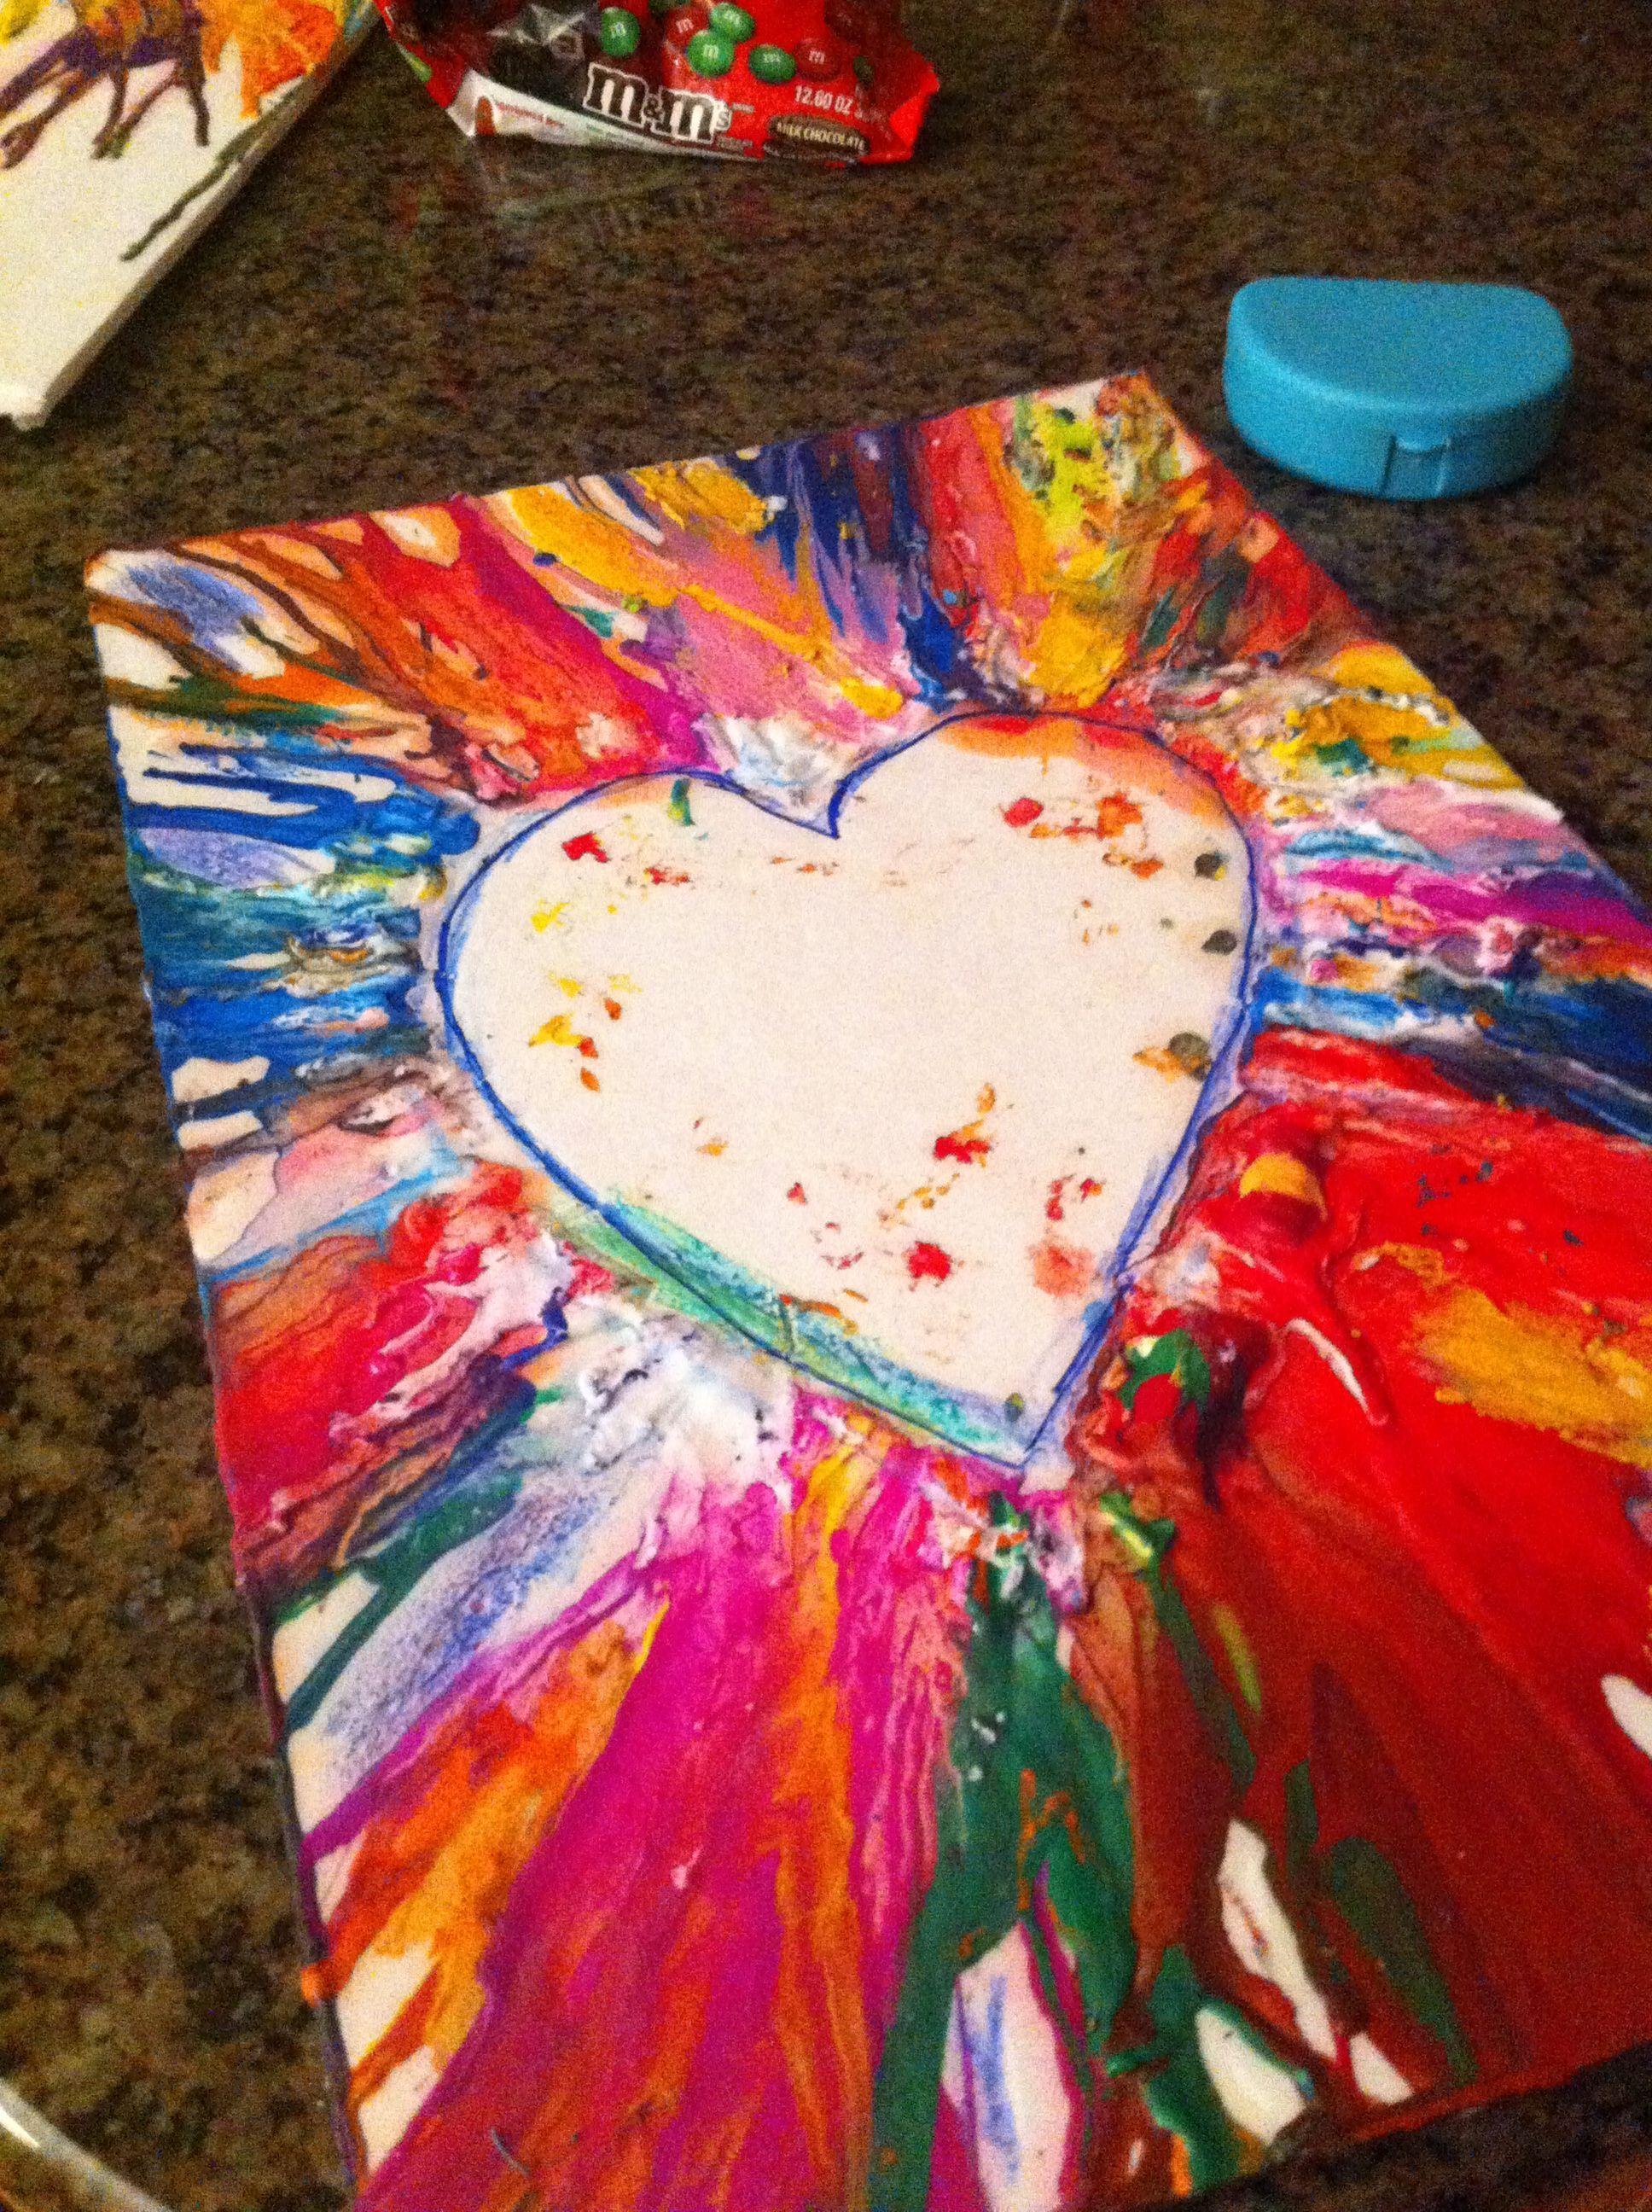 Melted crayon heart #crayonheart Melted crayon heart #crayonheart Melted crayon heart #crayonheart Melted crayon heart #crayonheart